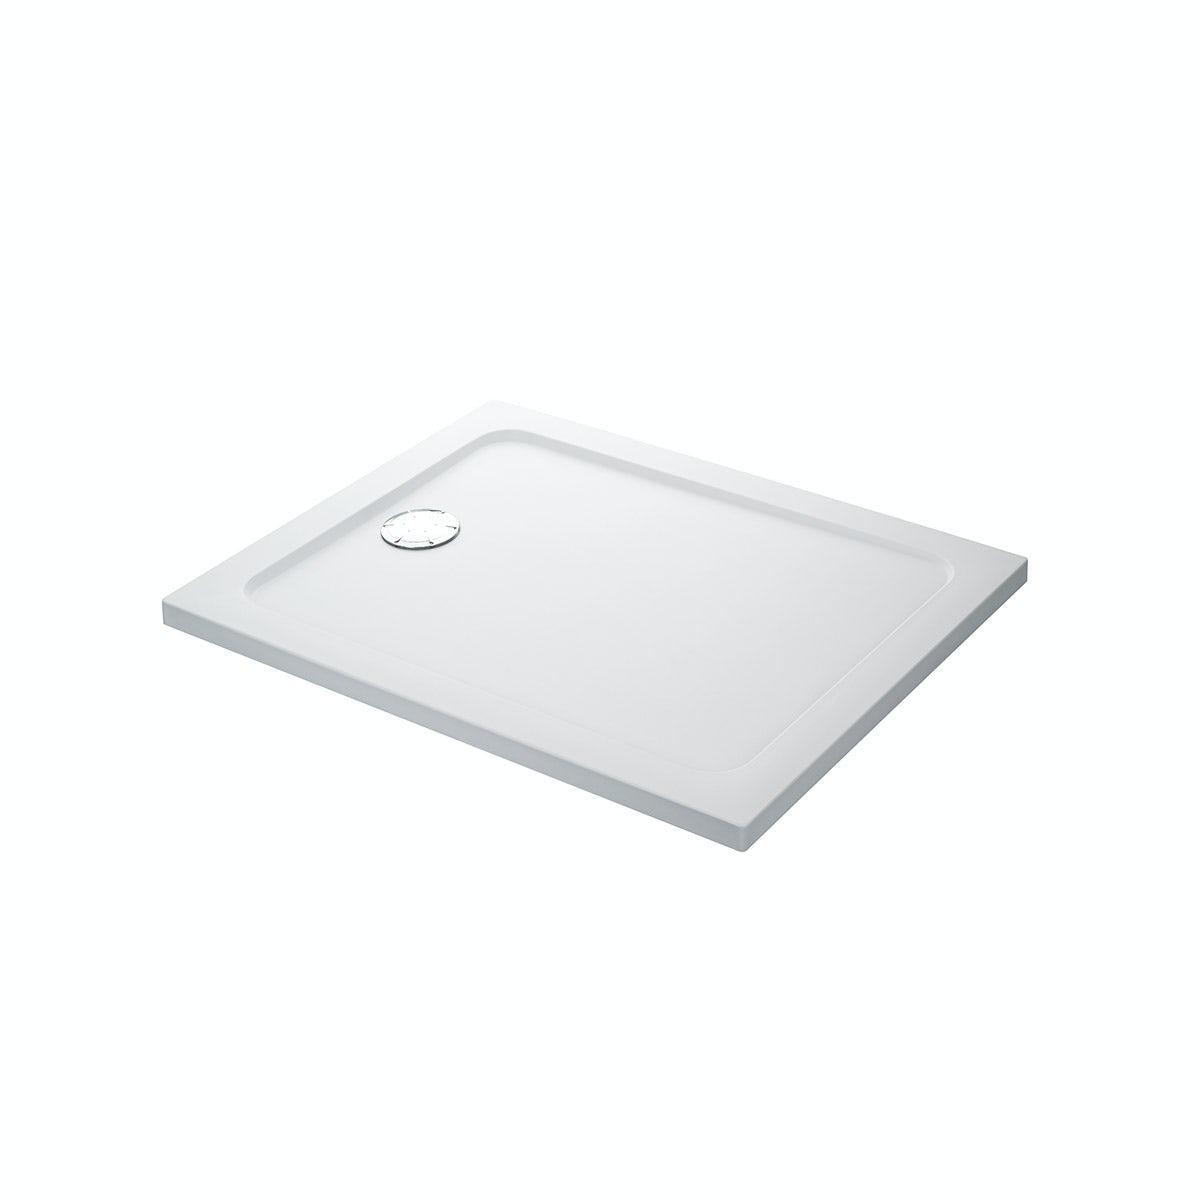 Mira Flight Safe low level anti-slip rectangular shower tray 1200 x 800